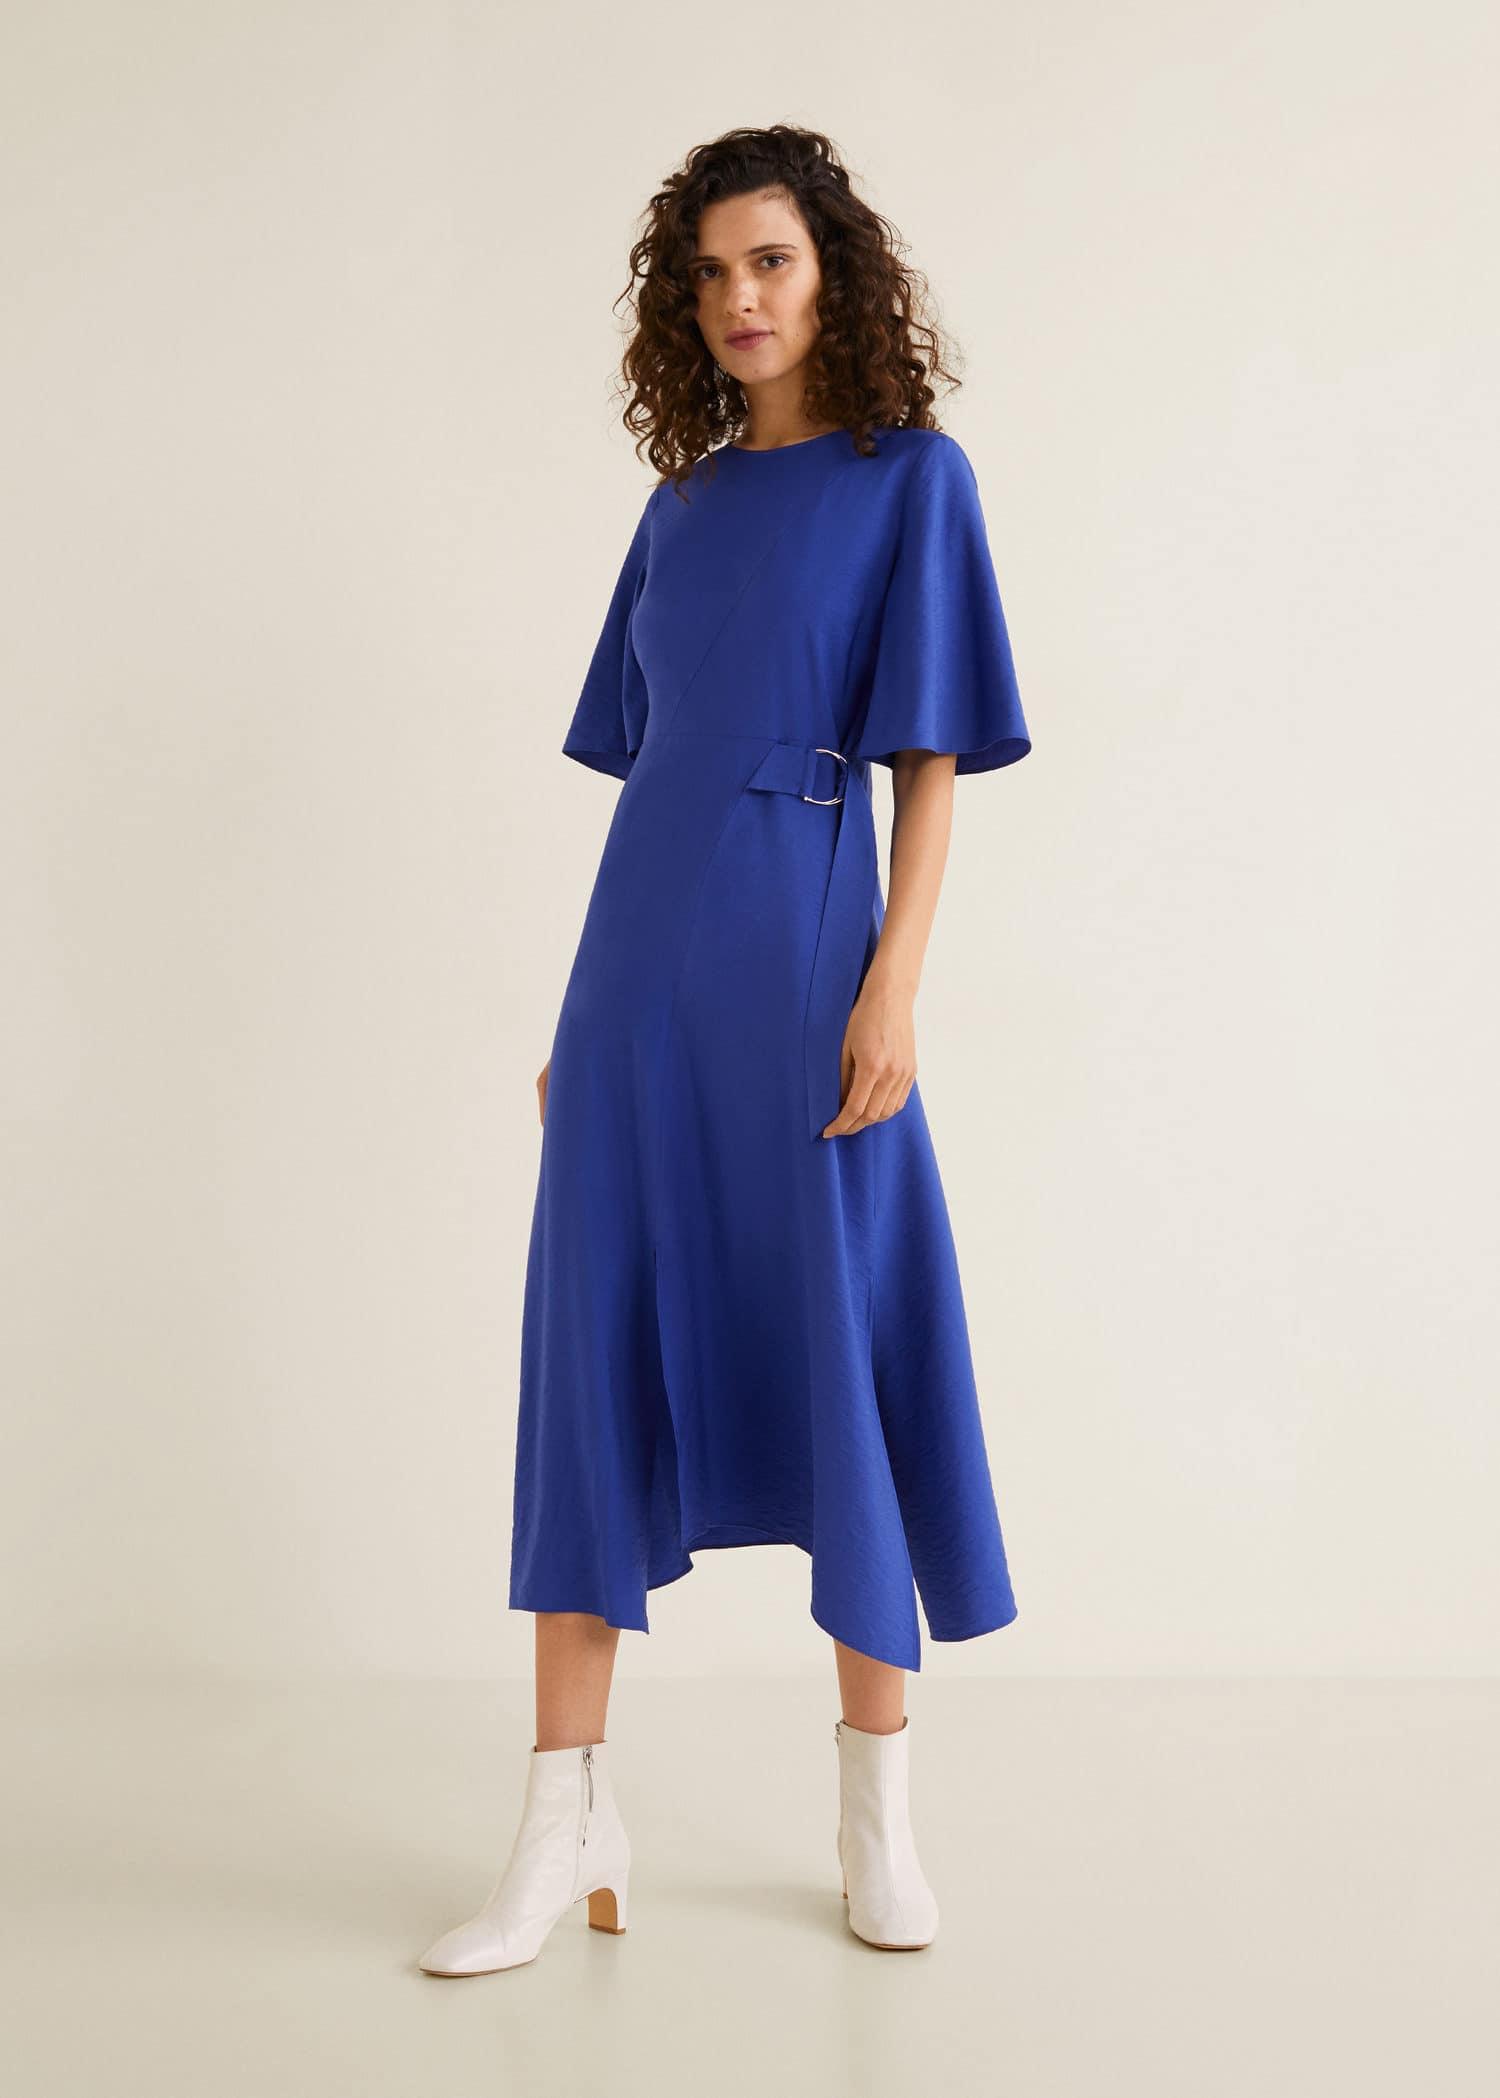 Vestidos de noche cheap online